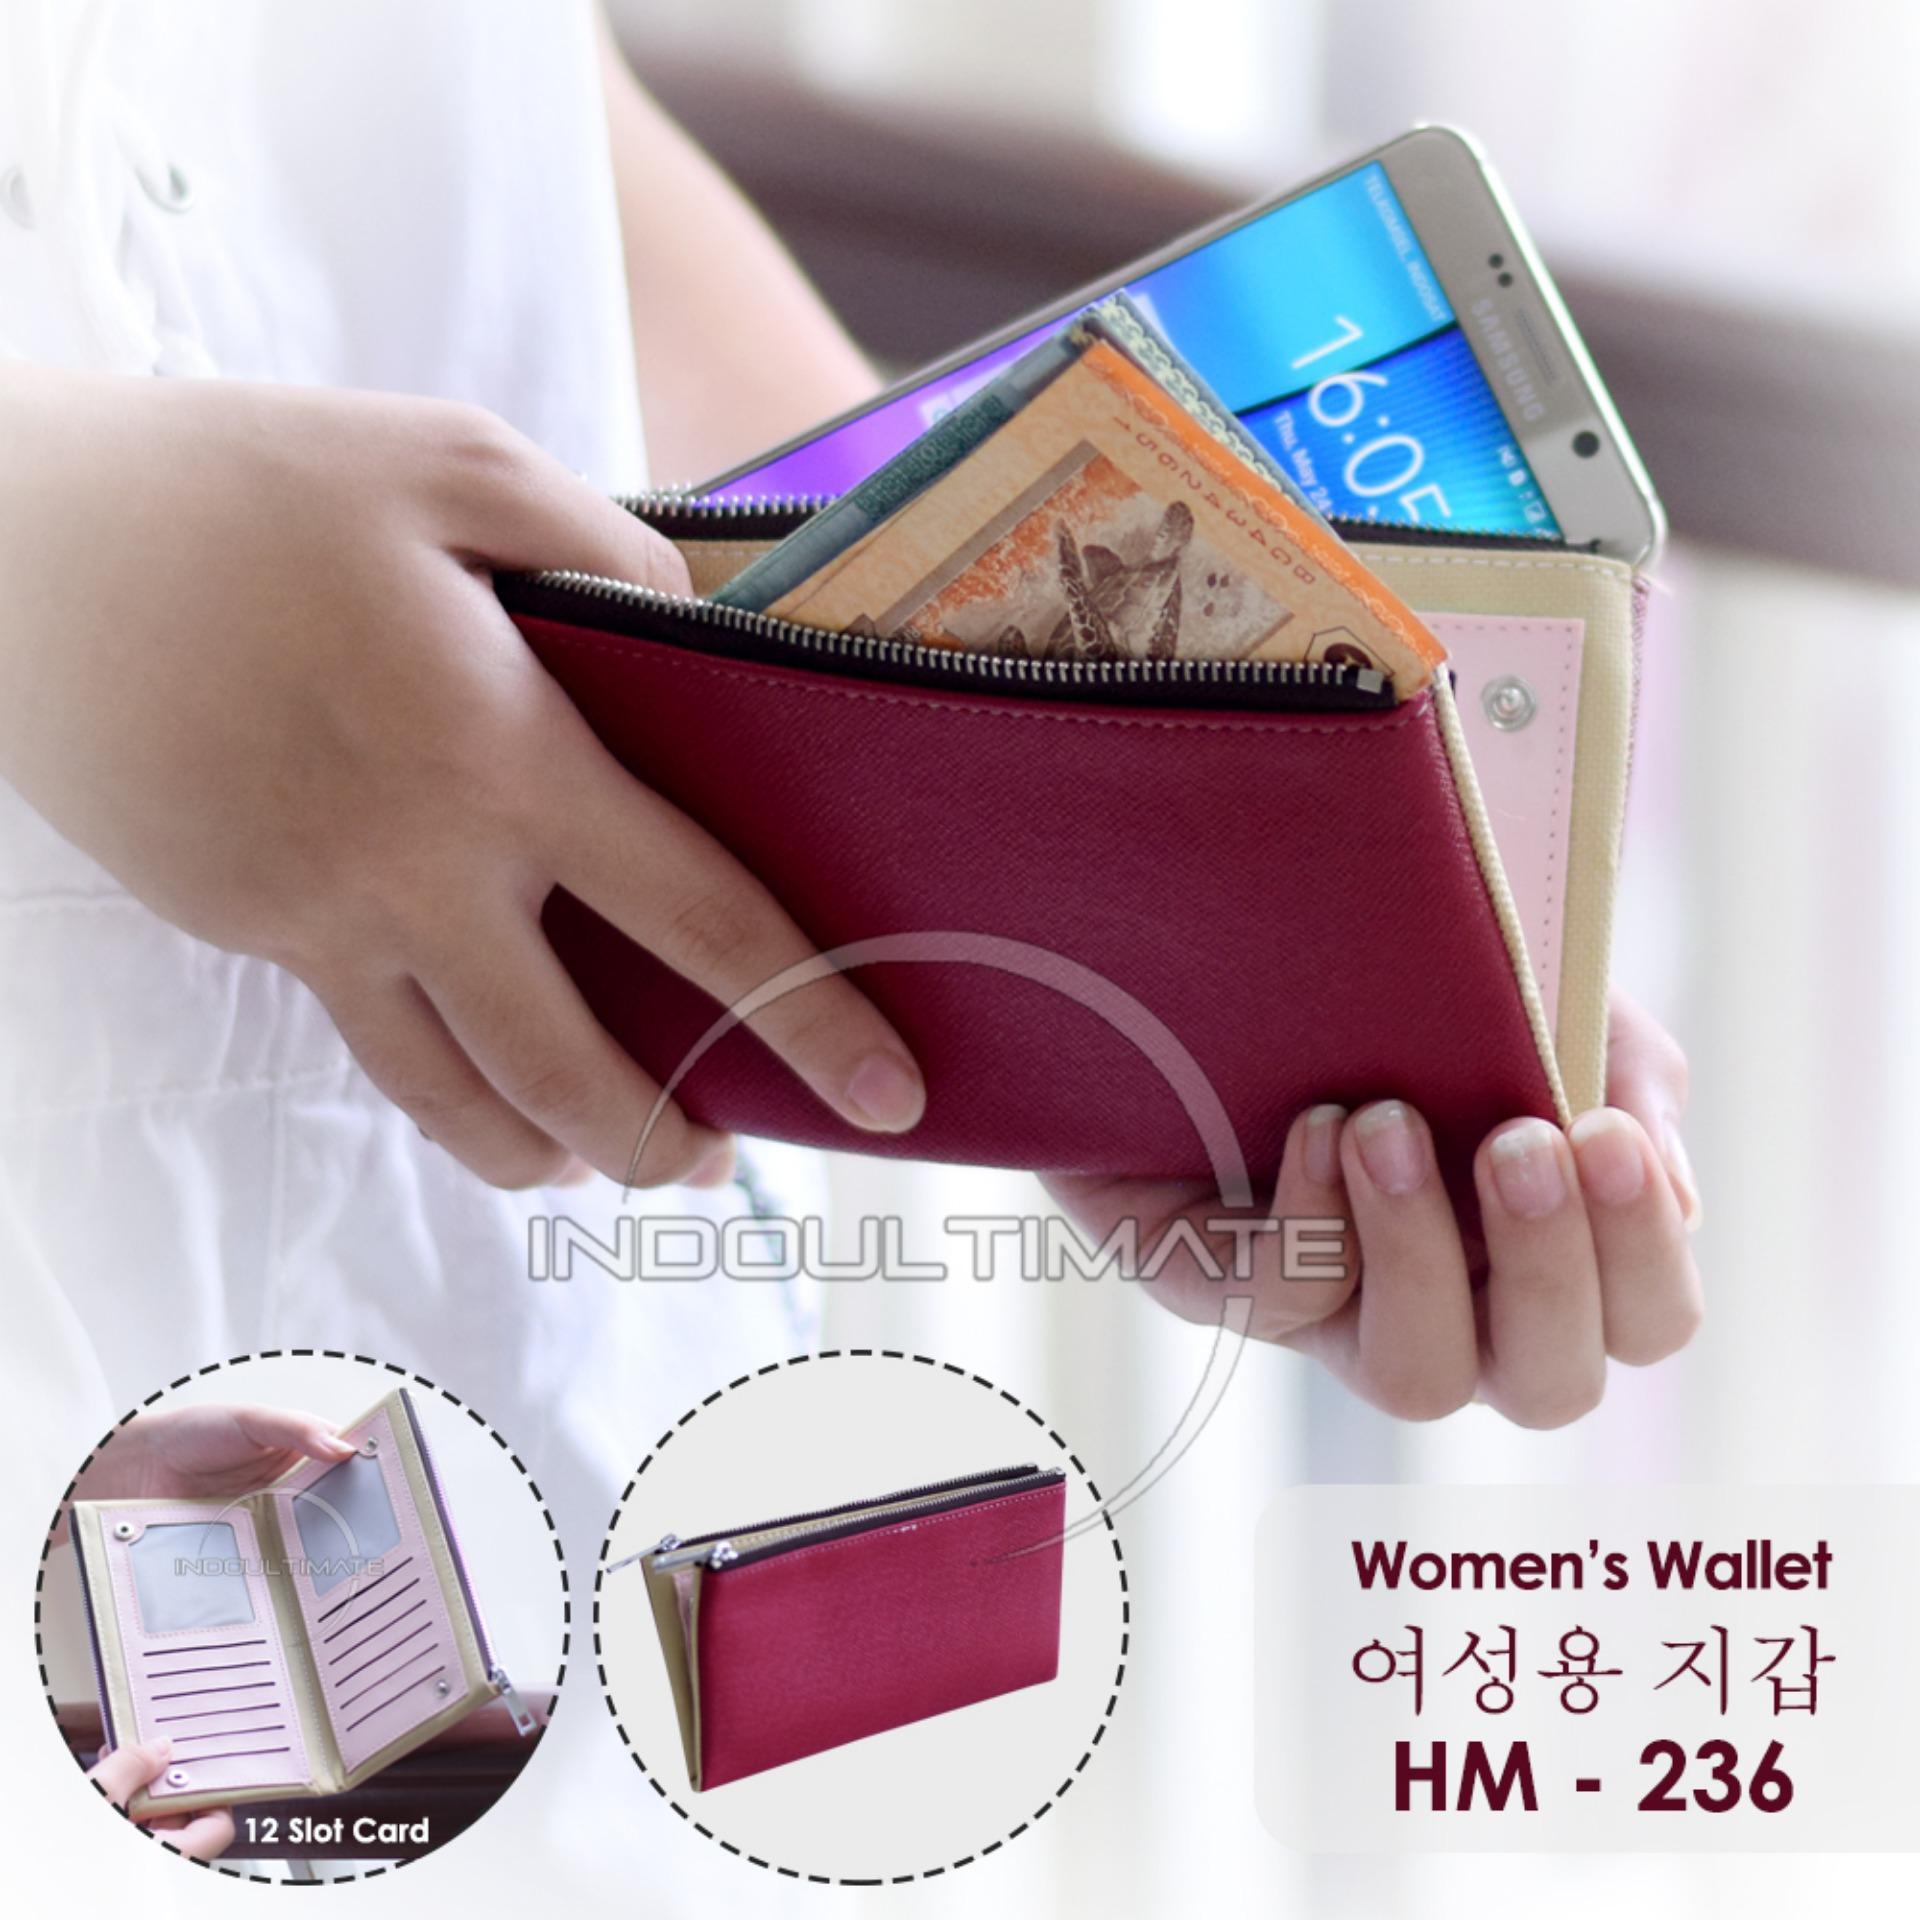 Ultimate Dompet Wanita HM-236 - Maroon / Dompet Cewek / Cewe Kartu ATM Panjang Kulit Import Murah Lucu